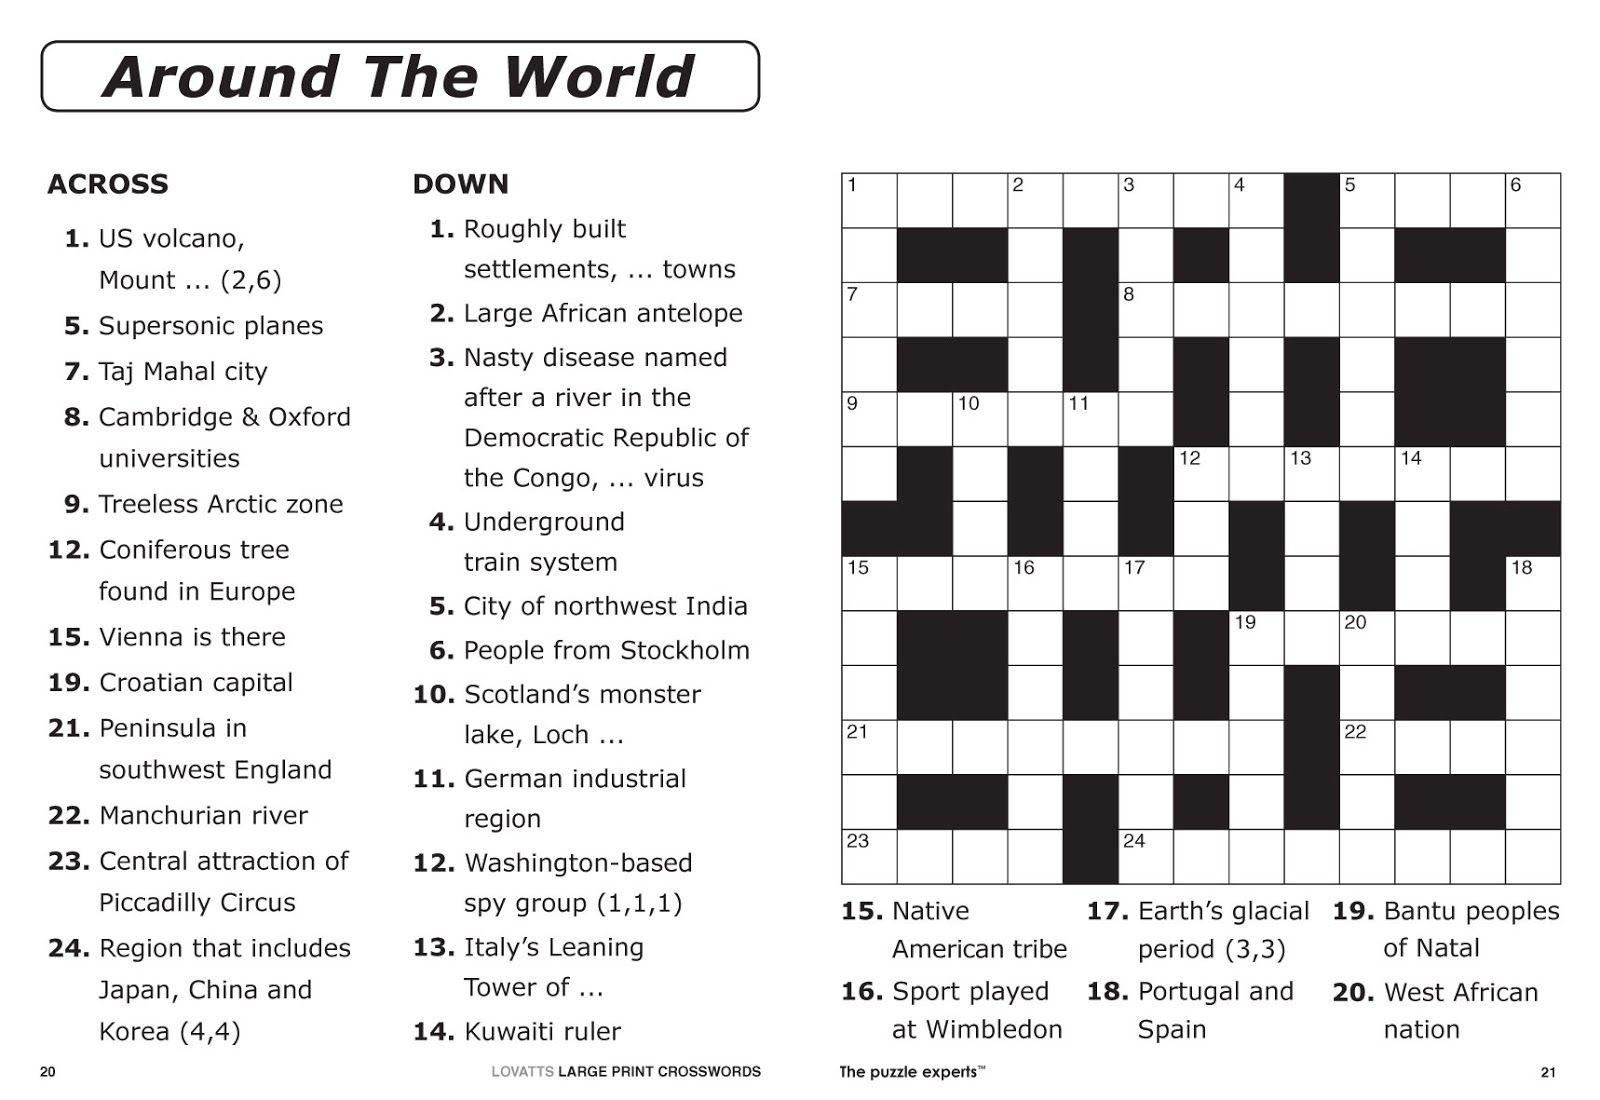 Easy Printable Crossword Puzzles | Elder Care & Dementia Care - Free - Printable Crossword Puzzles With Clues